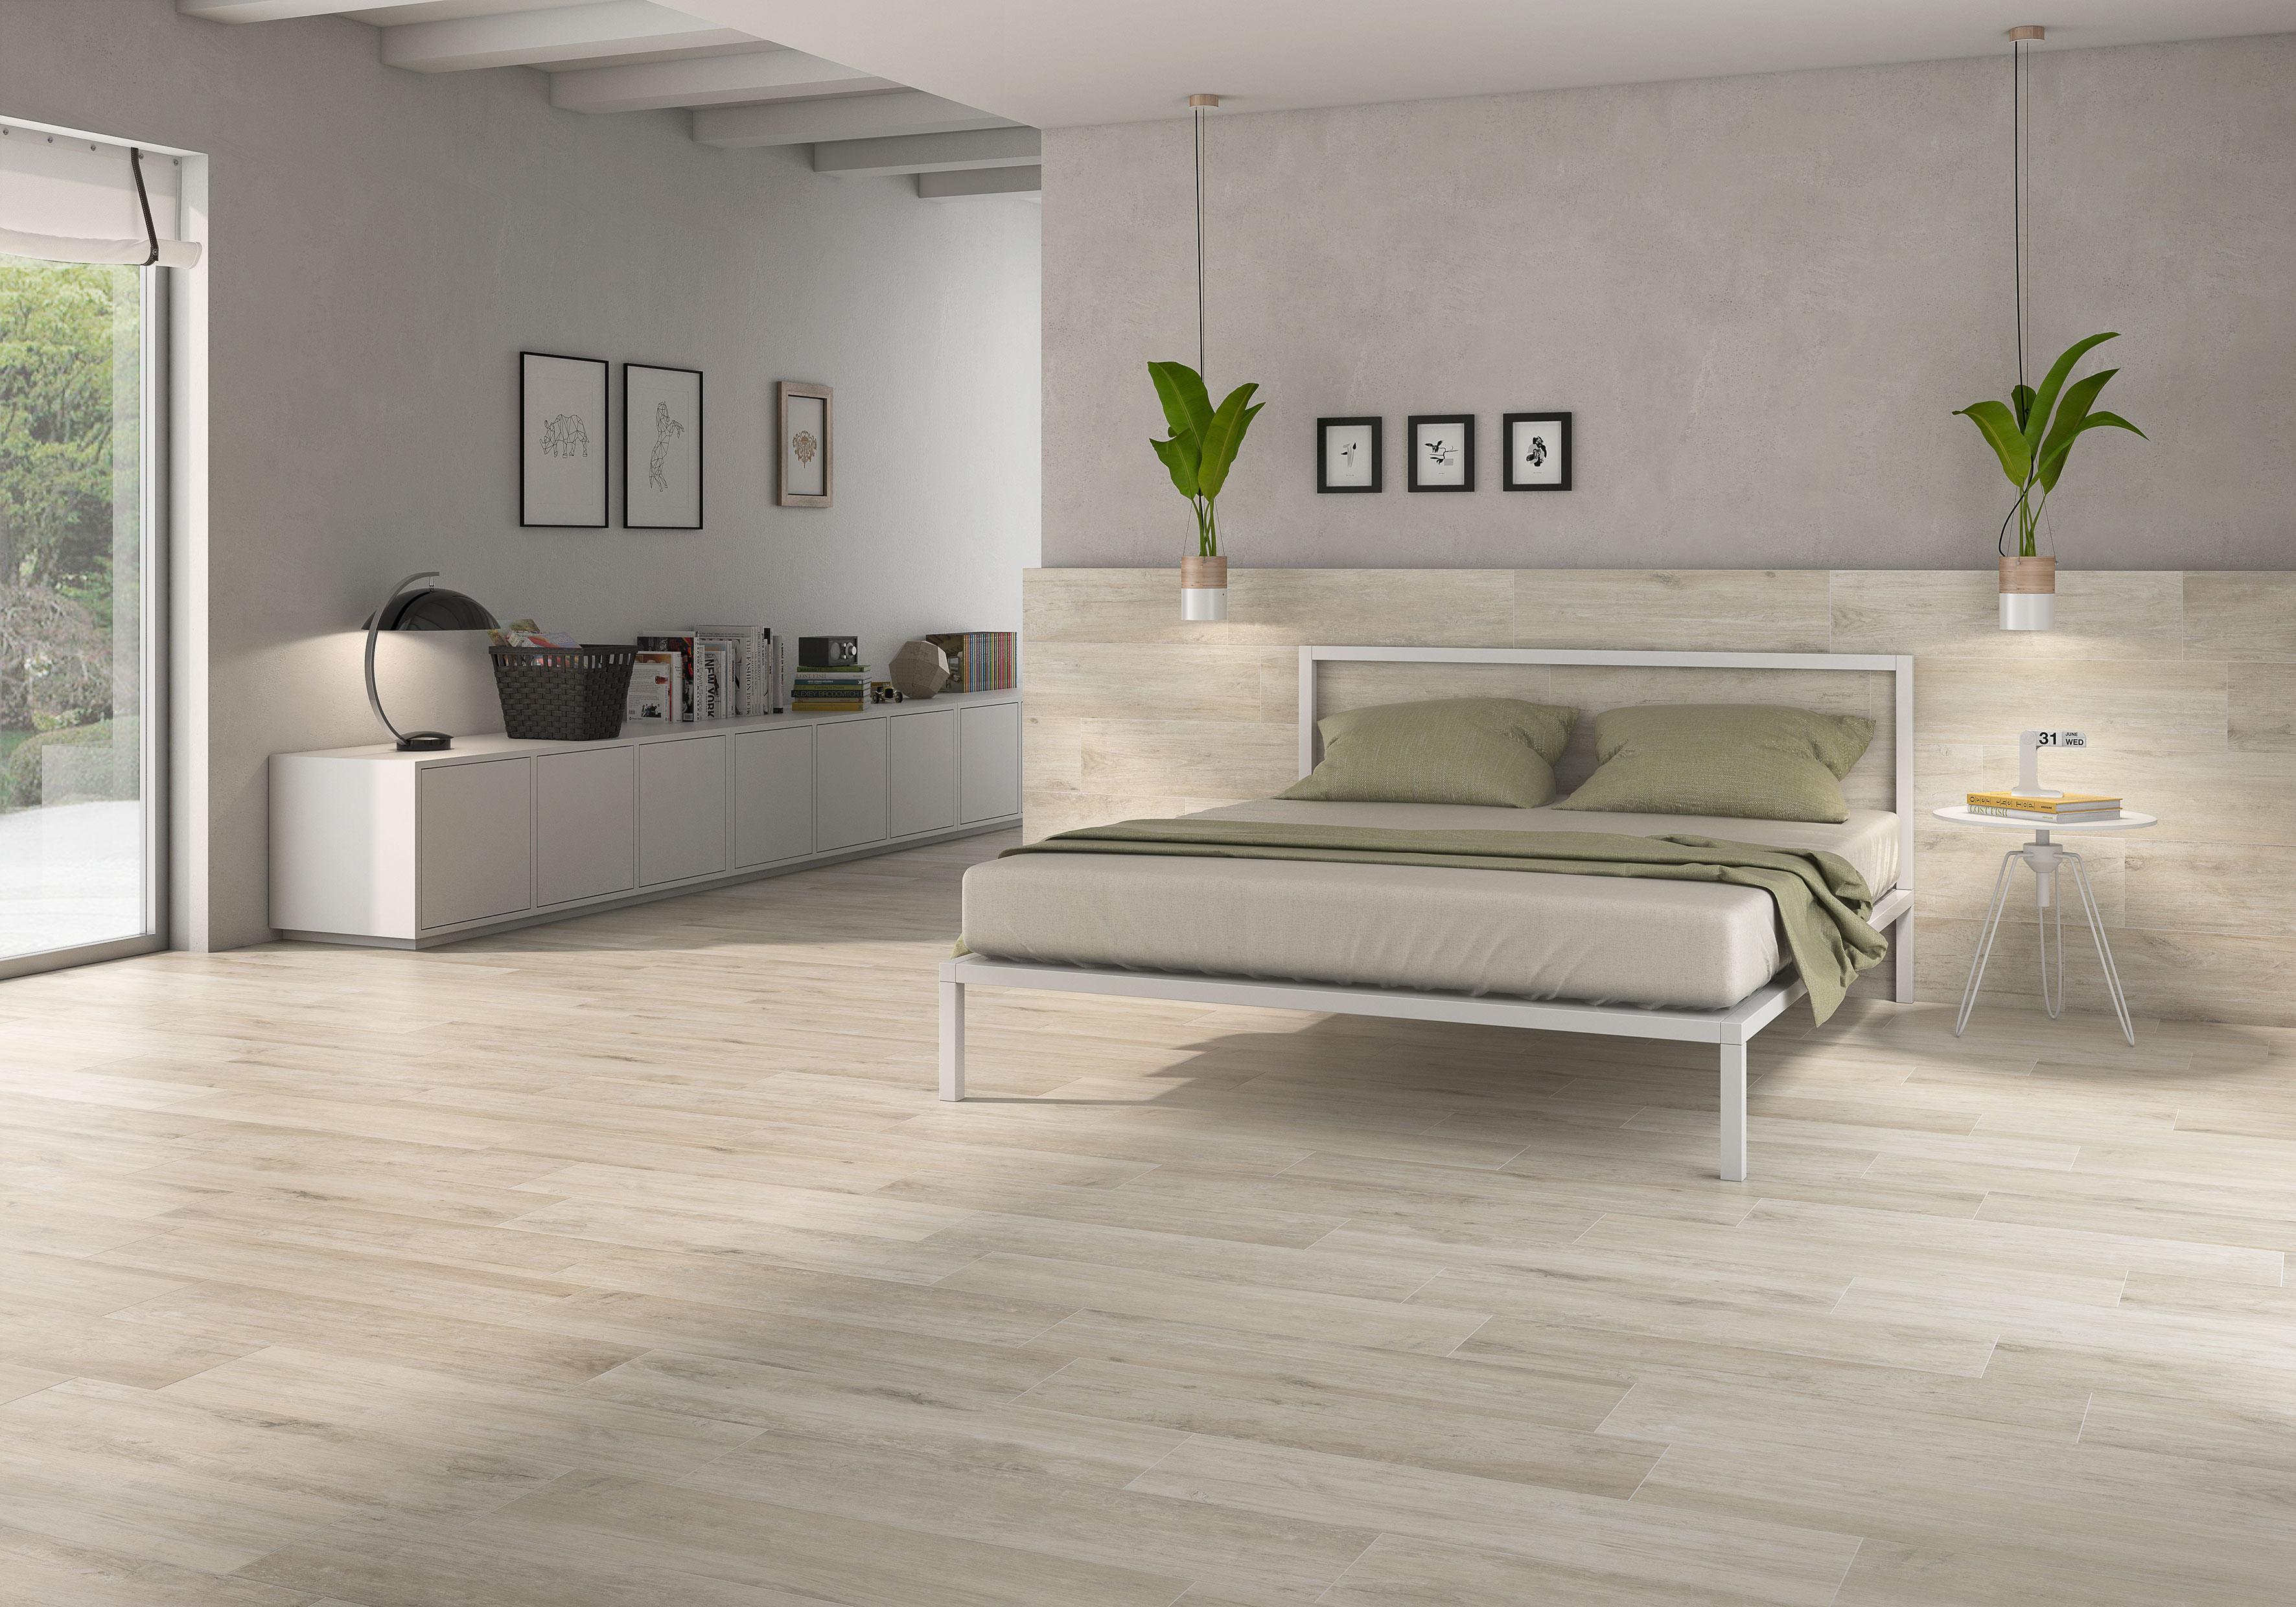 Wood Effect Tiles Ct Kingswood Musgo